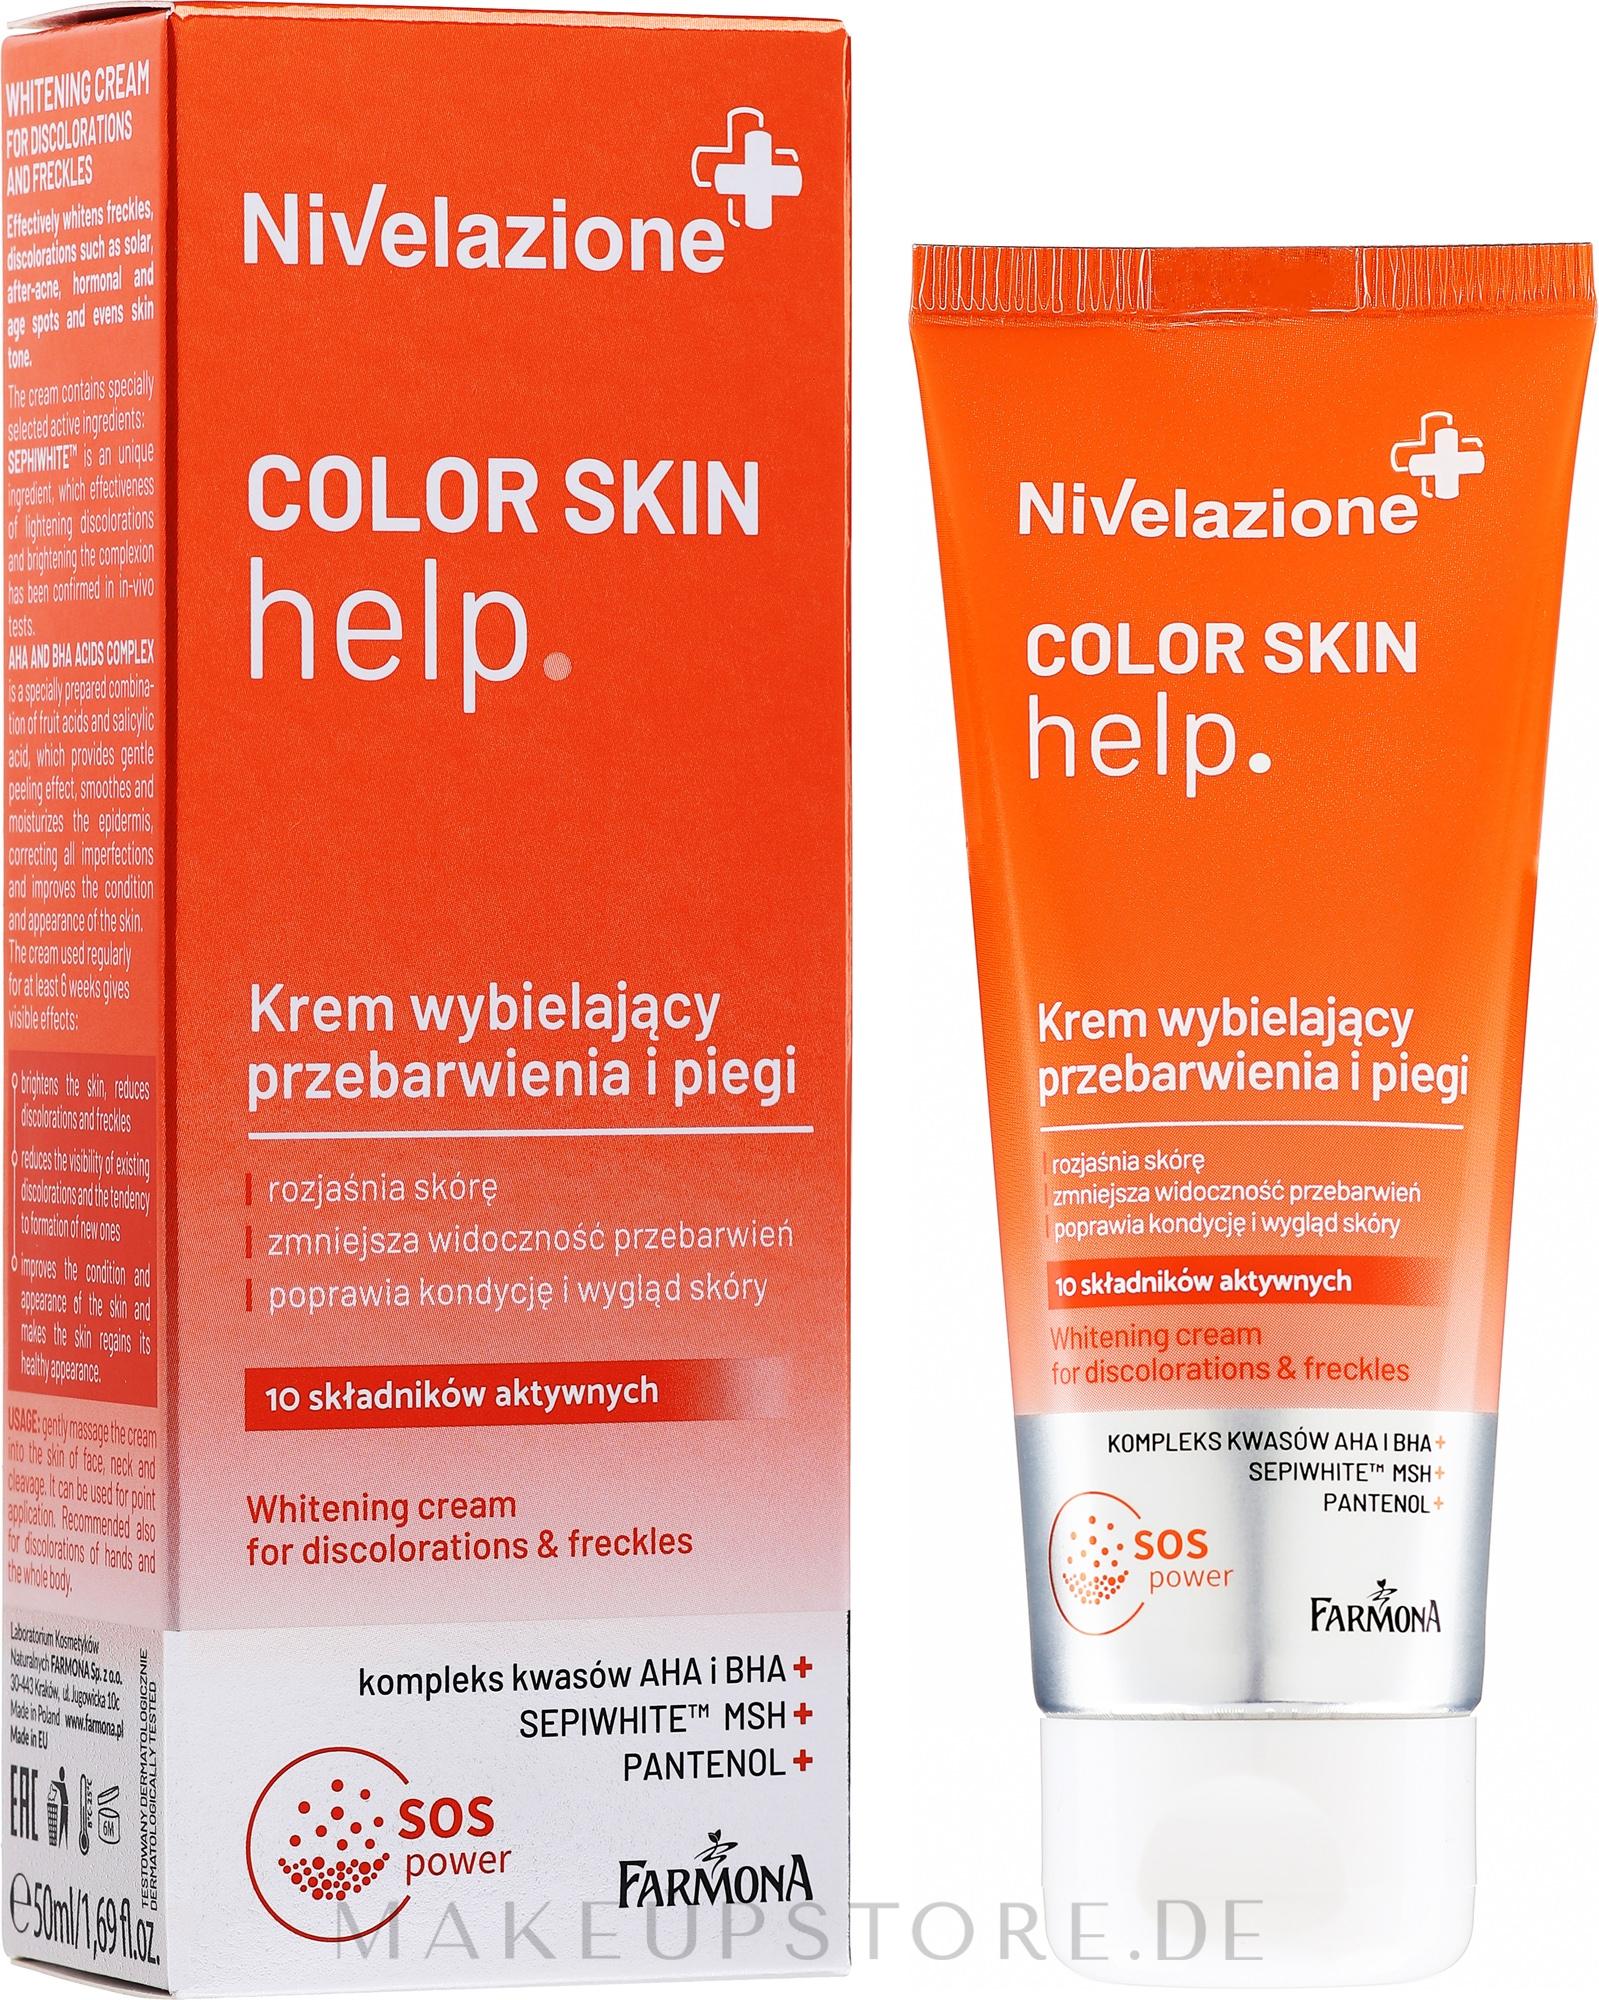 Bleichende Gesichtscreme - Farmona Nivelazione Whitening Cream — Bild 50 ml